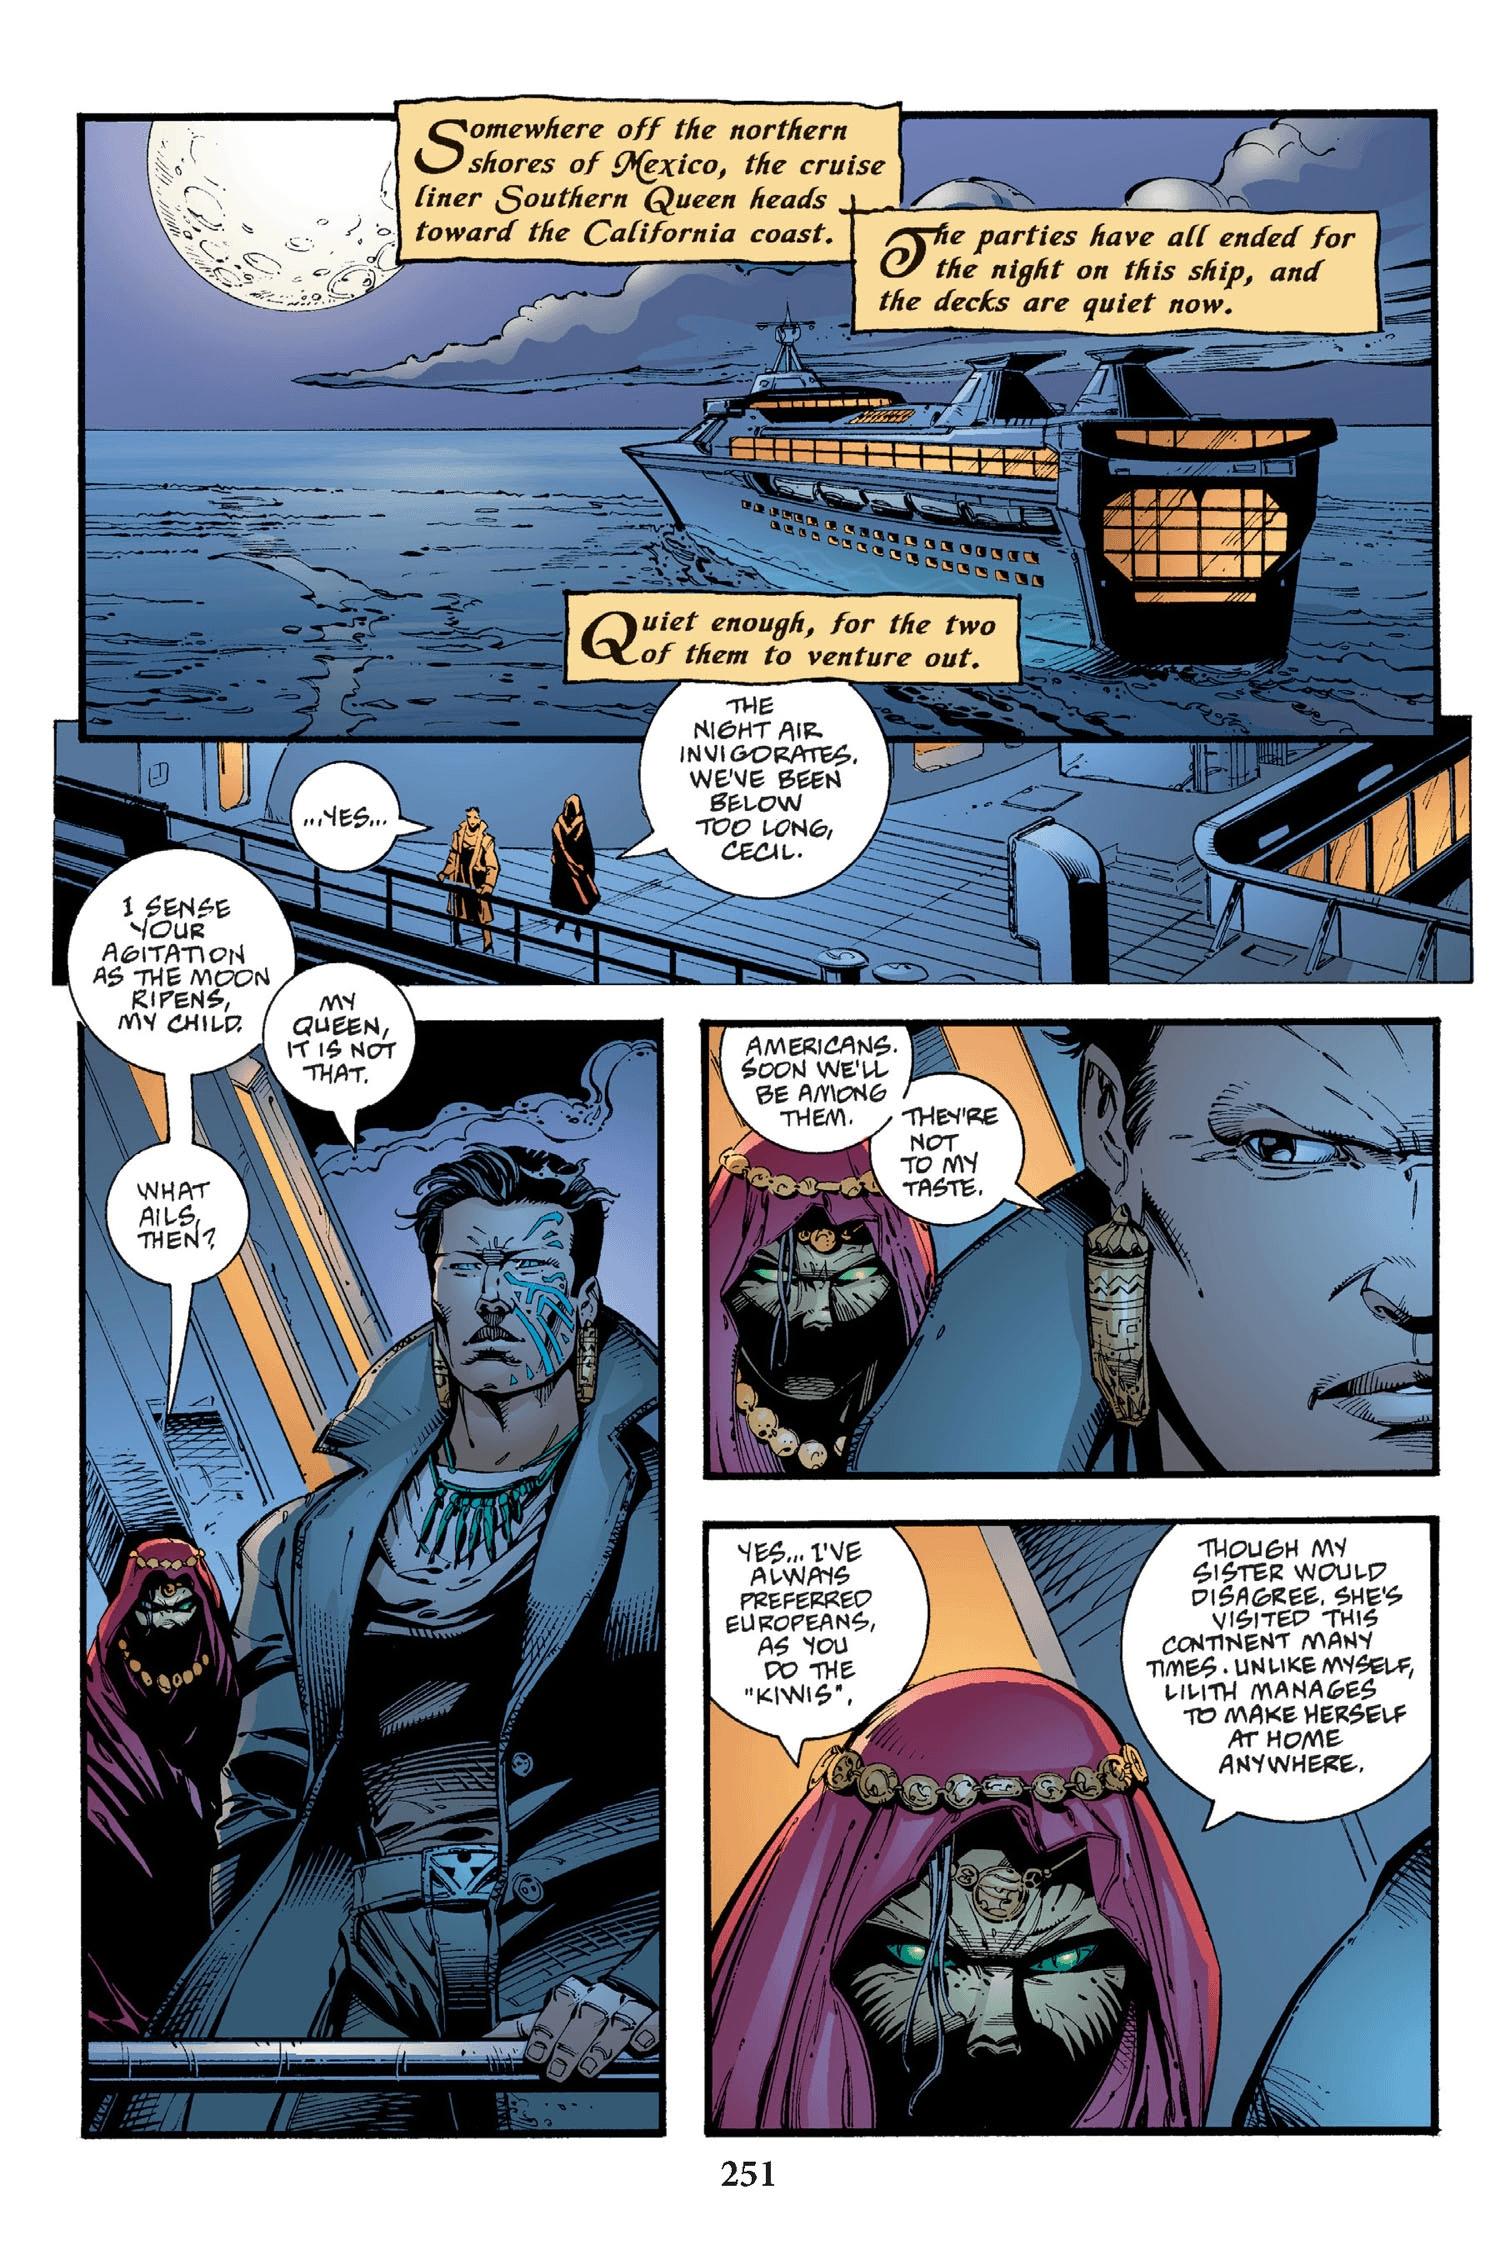 Read online Buffy the Vampire Slayer: Omnibus comic -  Issue # TPB 2 - 243